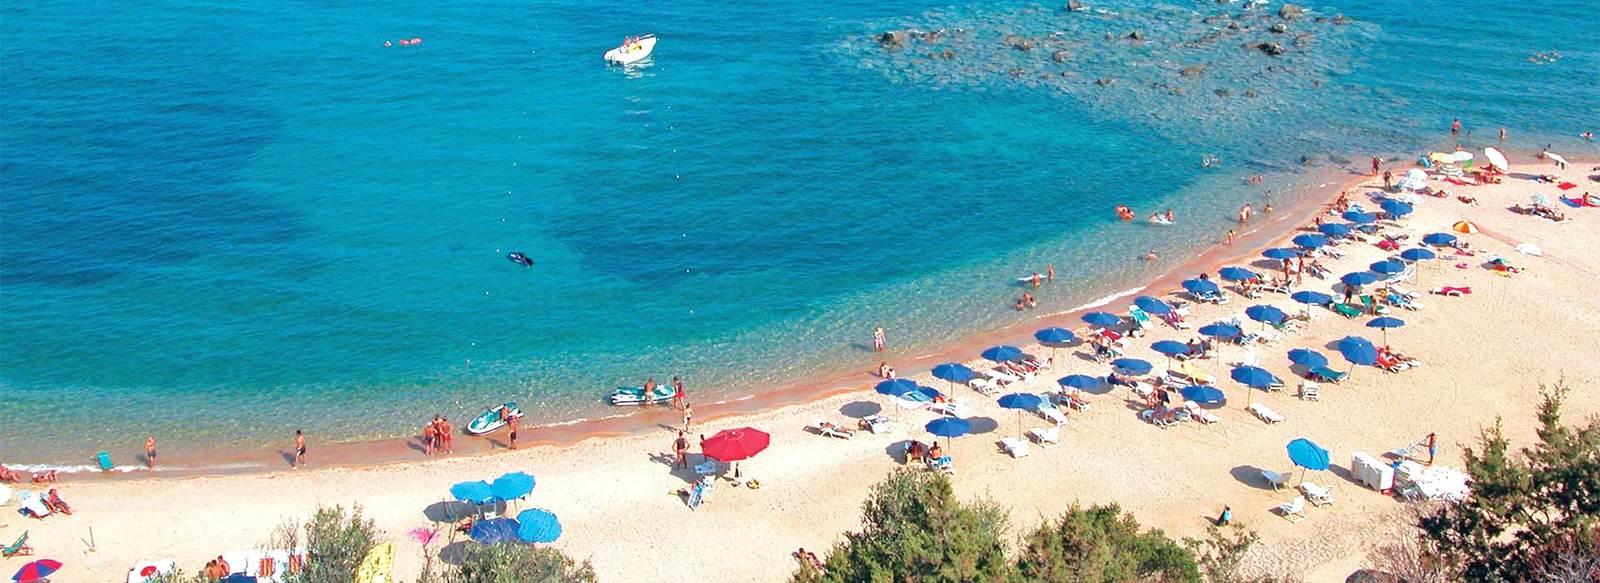 Sardegna low-budget